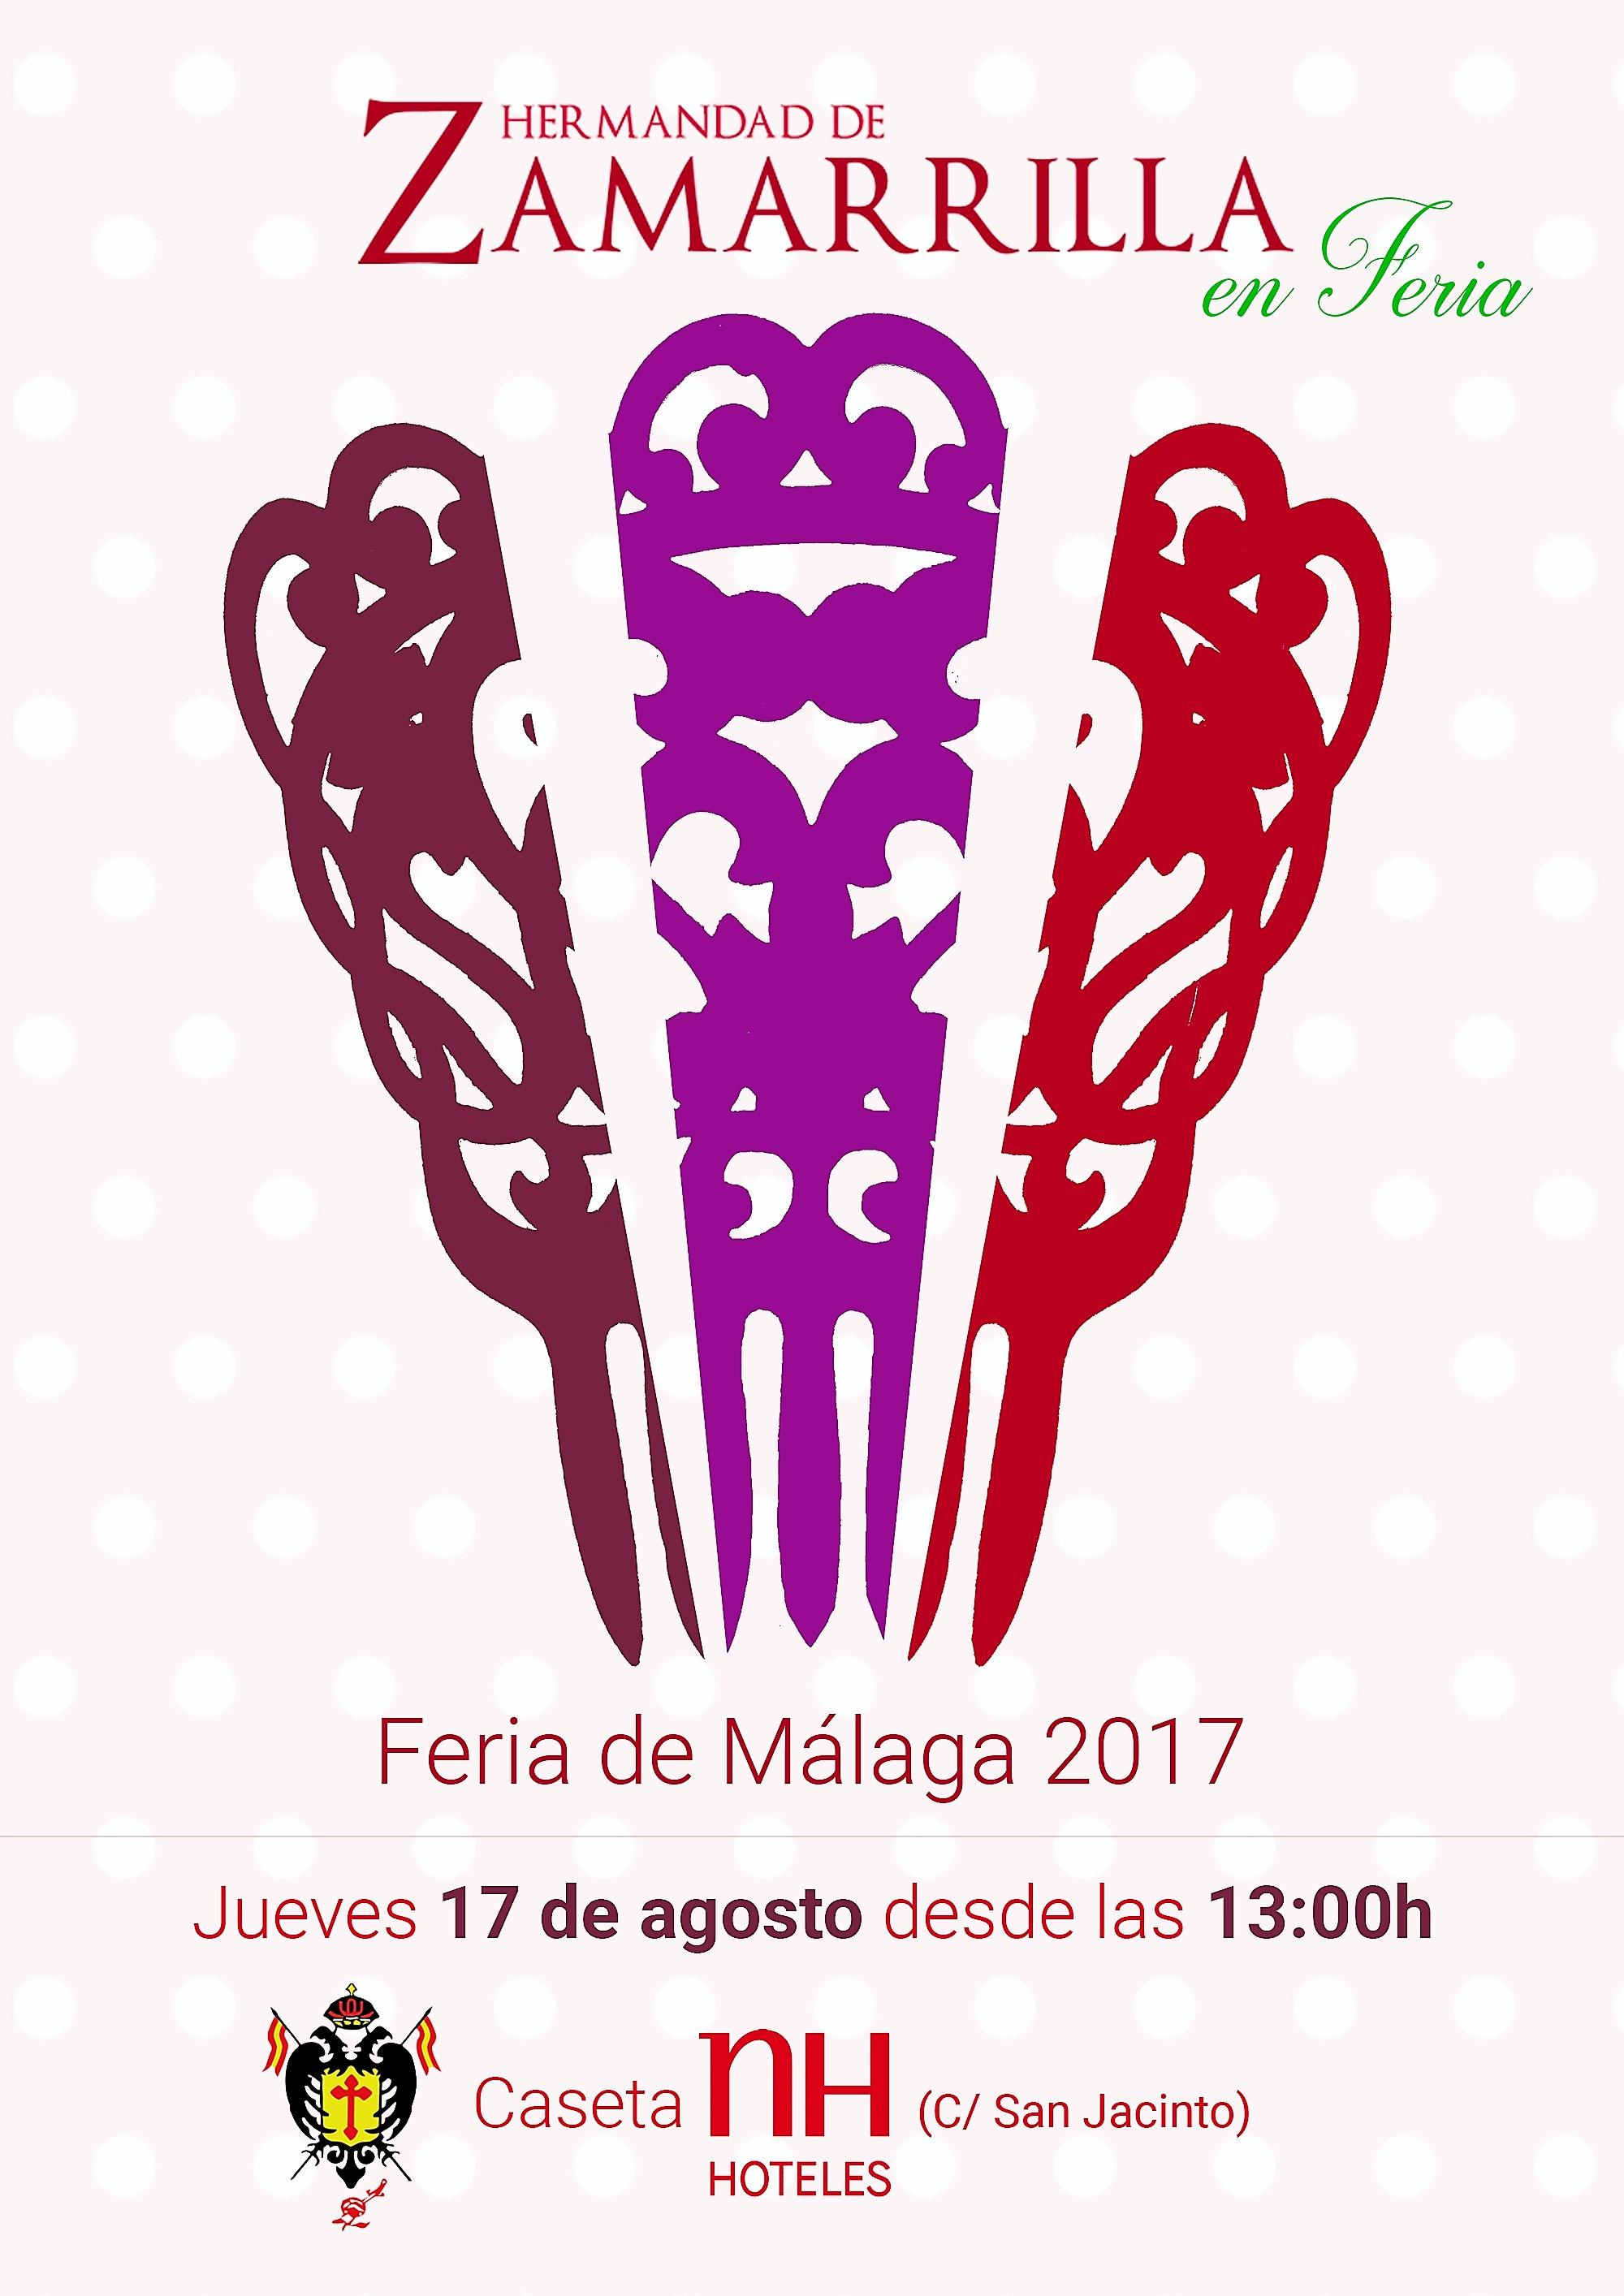 Gu a de las 29 casetas cofrades en la feria de m laga for Feria outlet malaga 2017